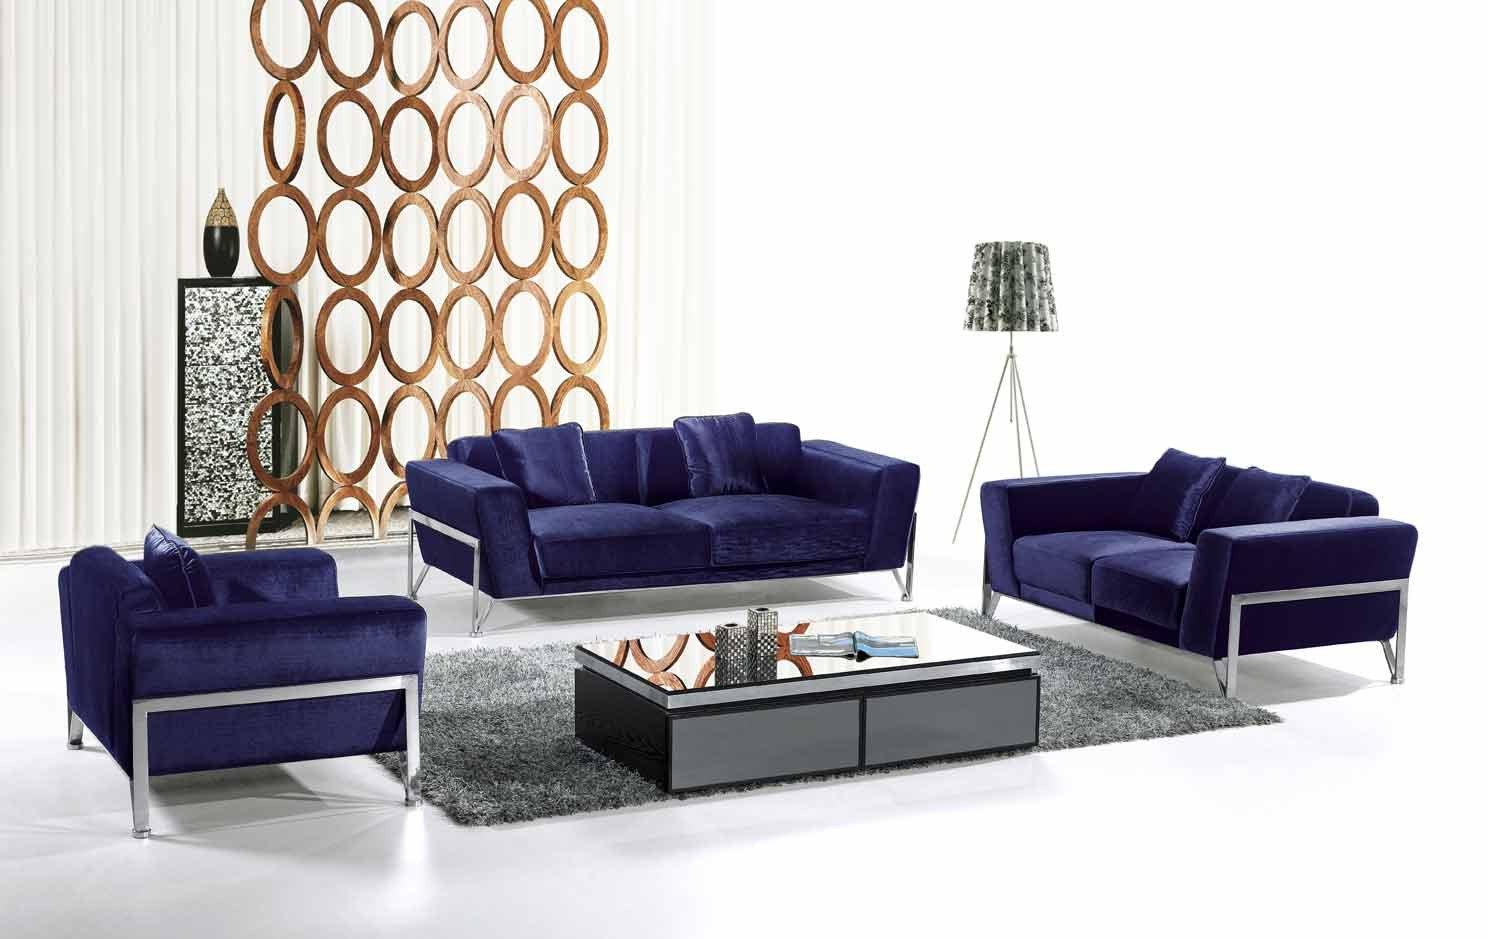 Living Room Furniture Ideas New Modern Living Room Furniture Ideas